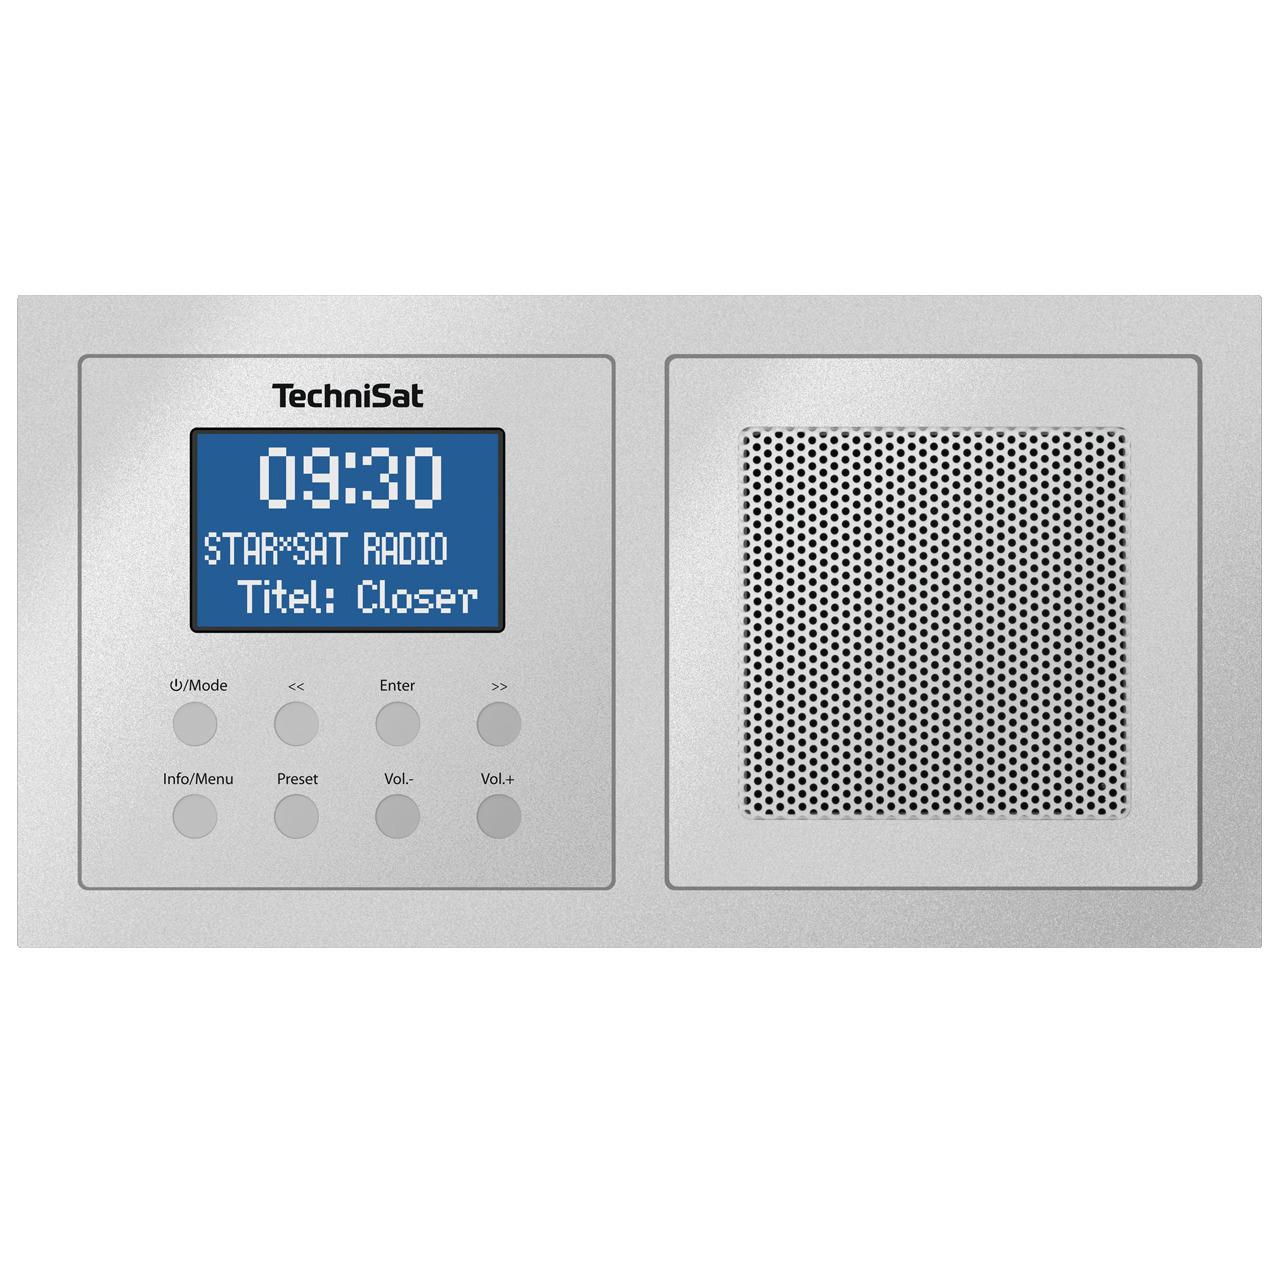 TechniSat Unterputzradio DigitRadio UP 1- DAB+-UKW-Radio- Bluetooth- mit Lautsprecher- silber